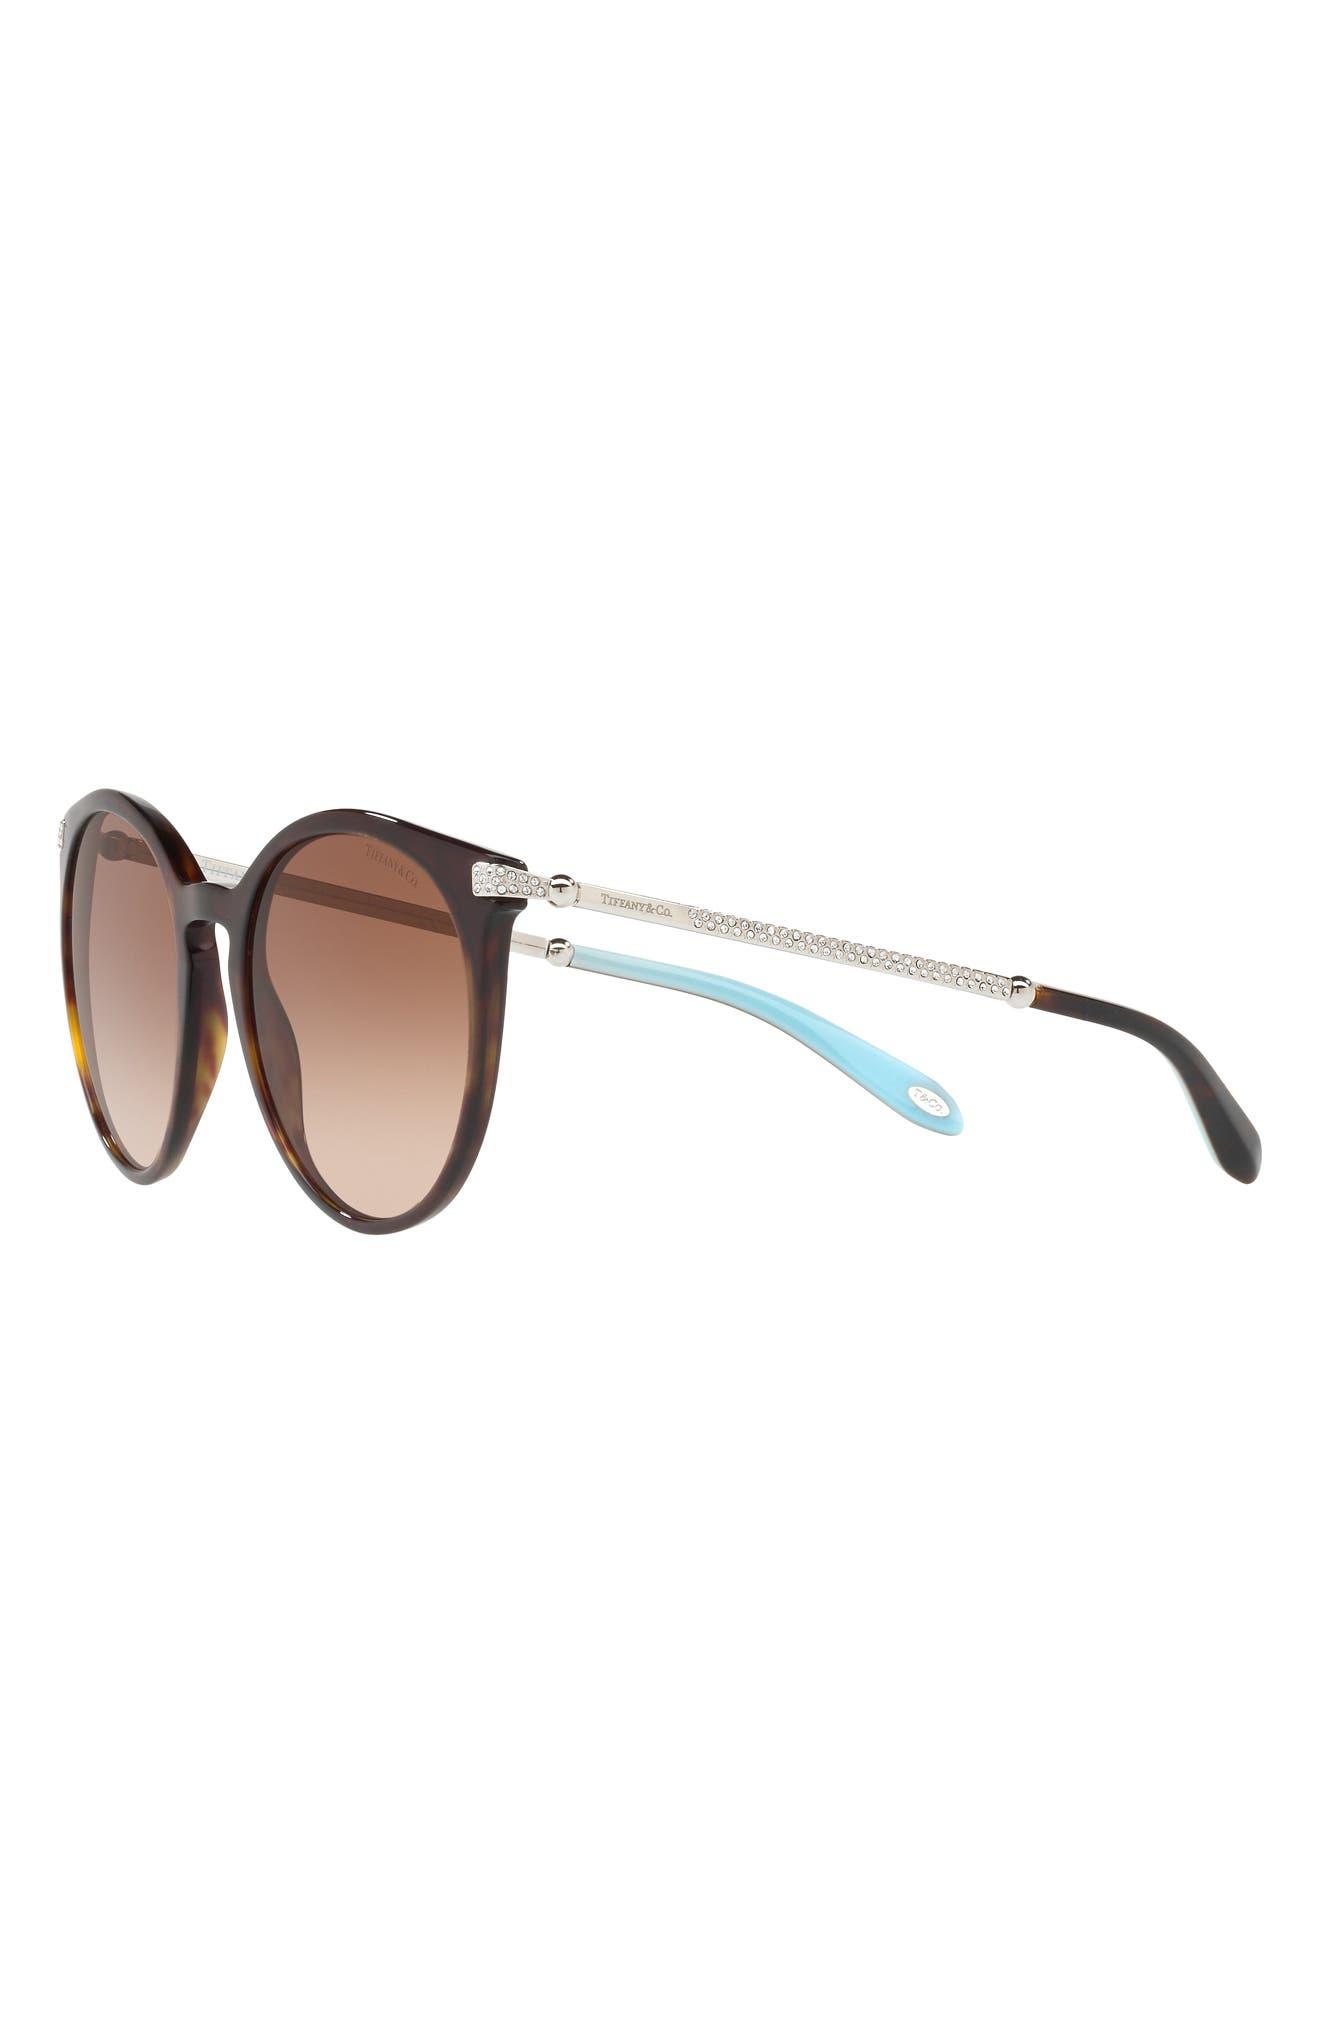 54mm Gradient Round Sunglasses,                             Alternate thumbnail 2, color,                             Dark Havana